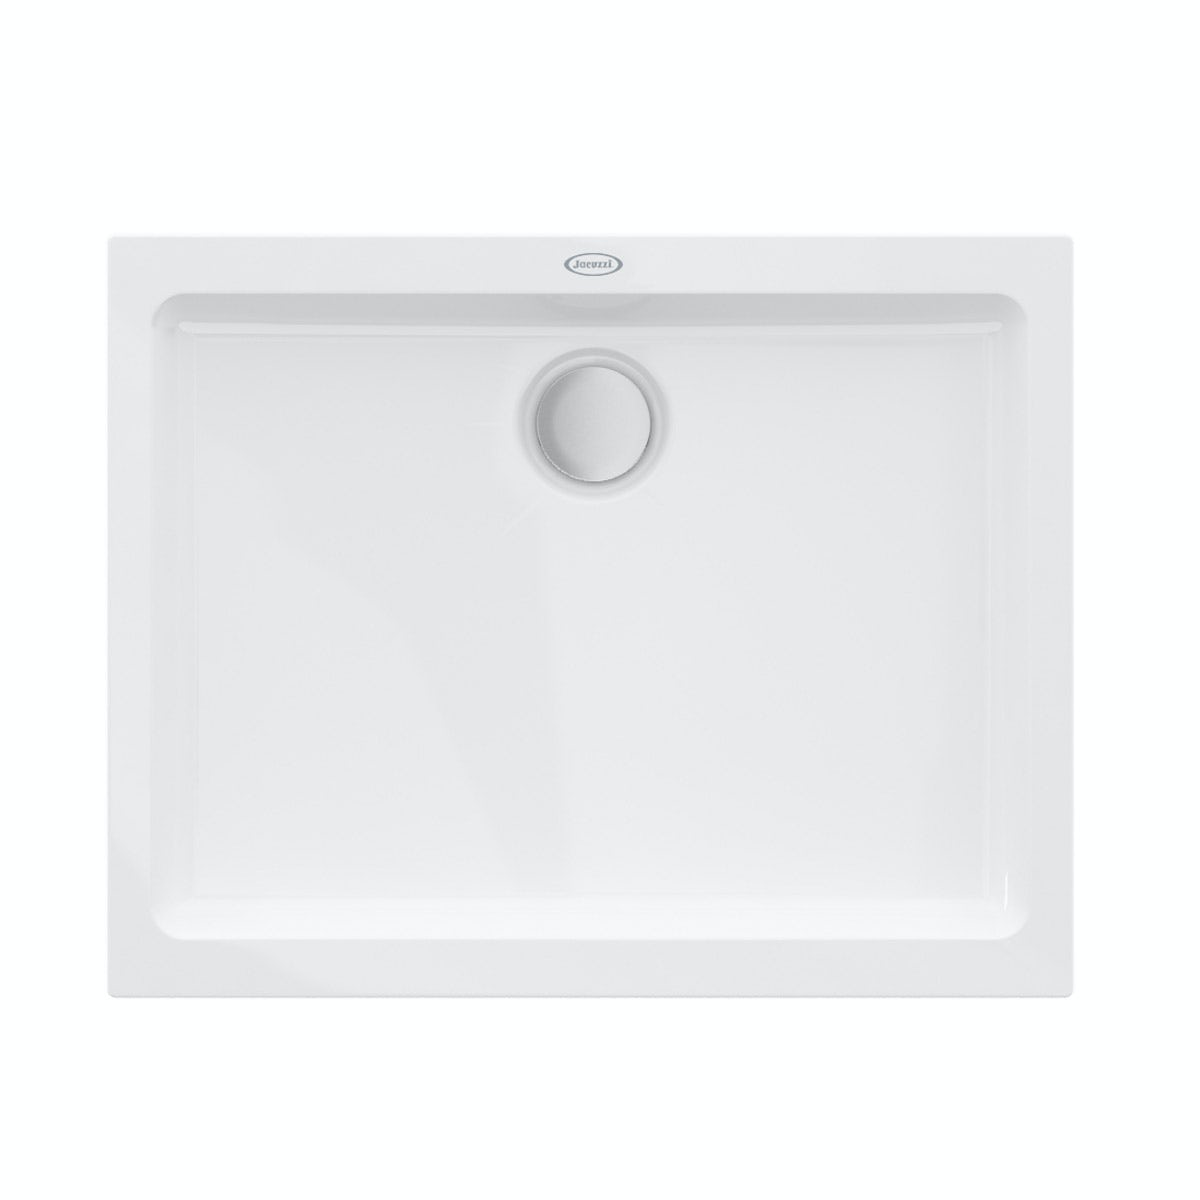 Jacuzzi Essentials matt white acrylic shower tray 1000 x 800